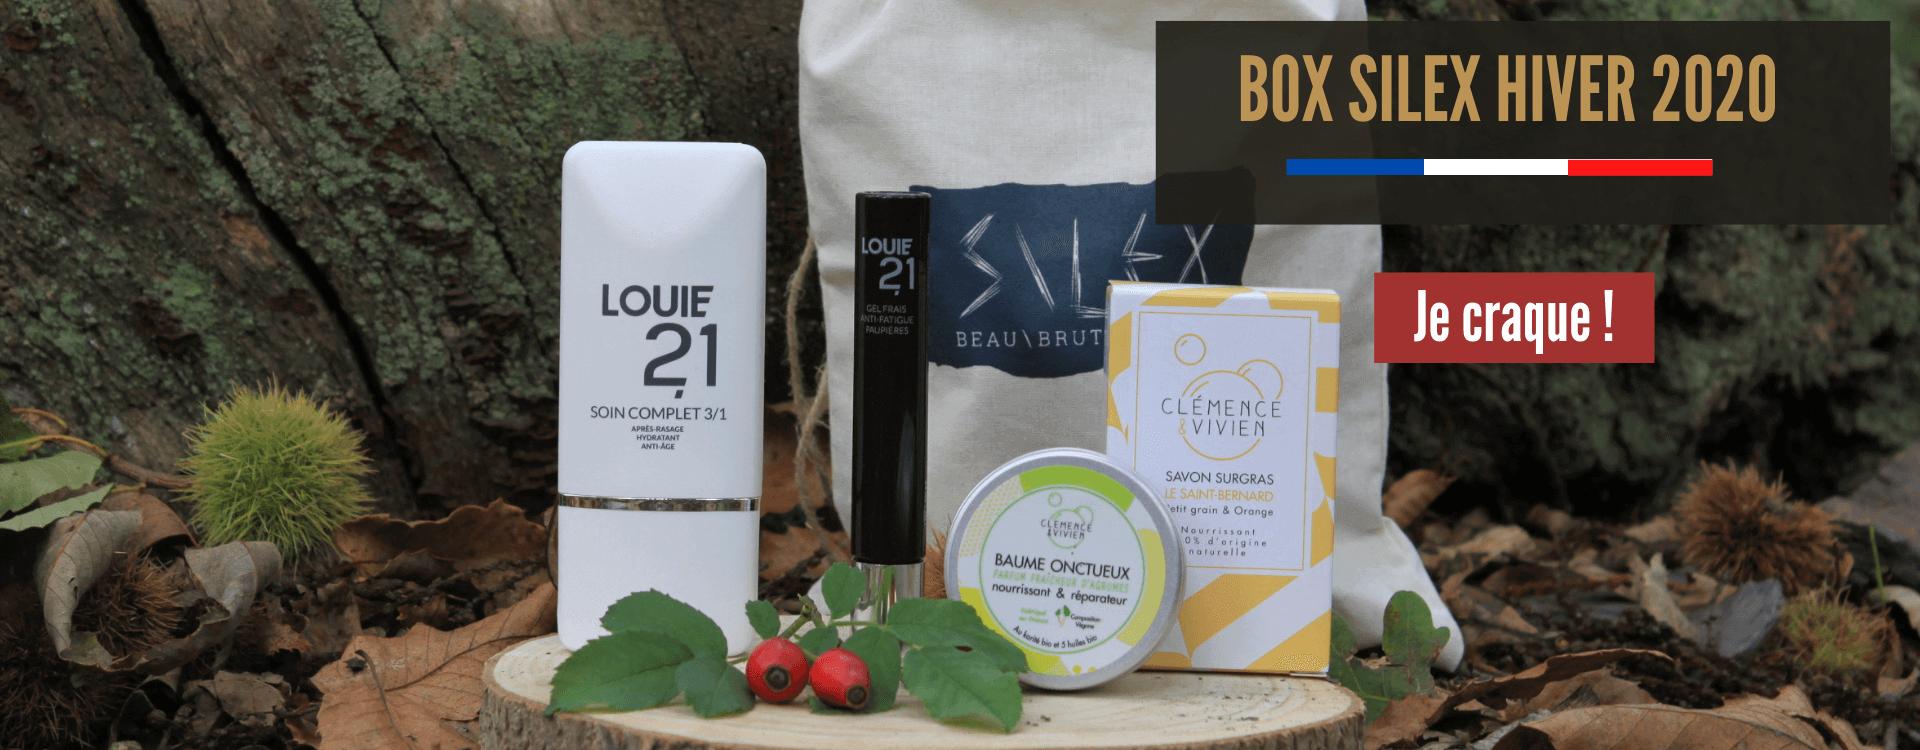 Box Silex Hiver 2020